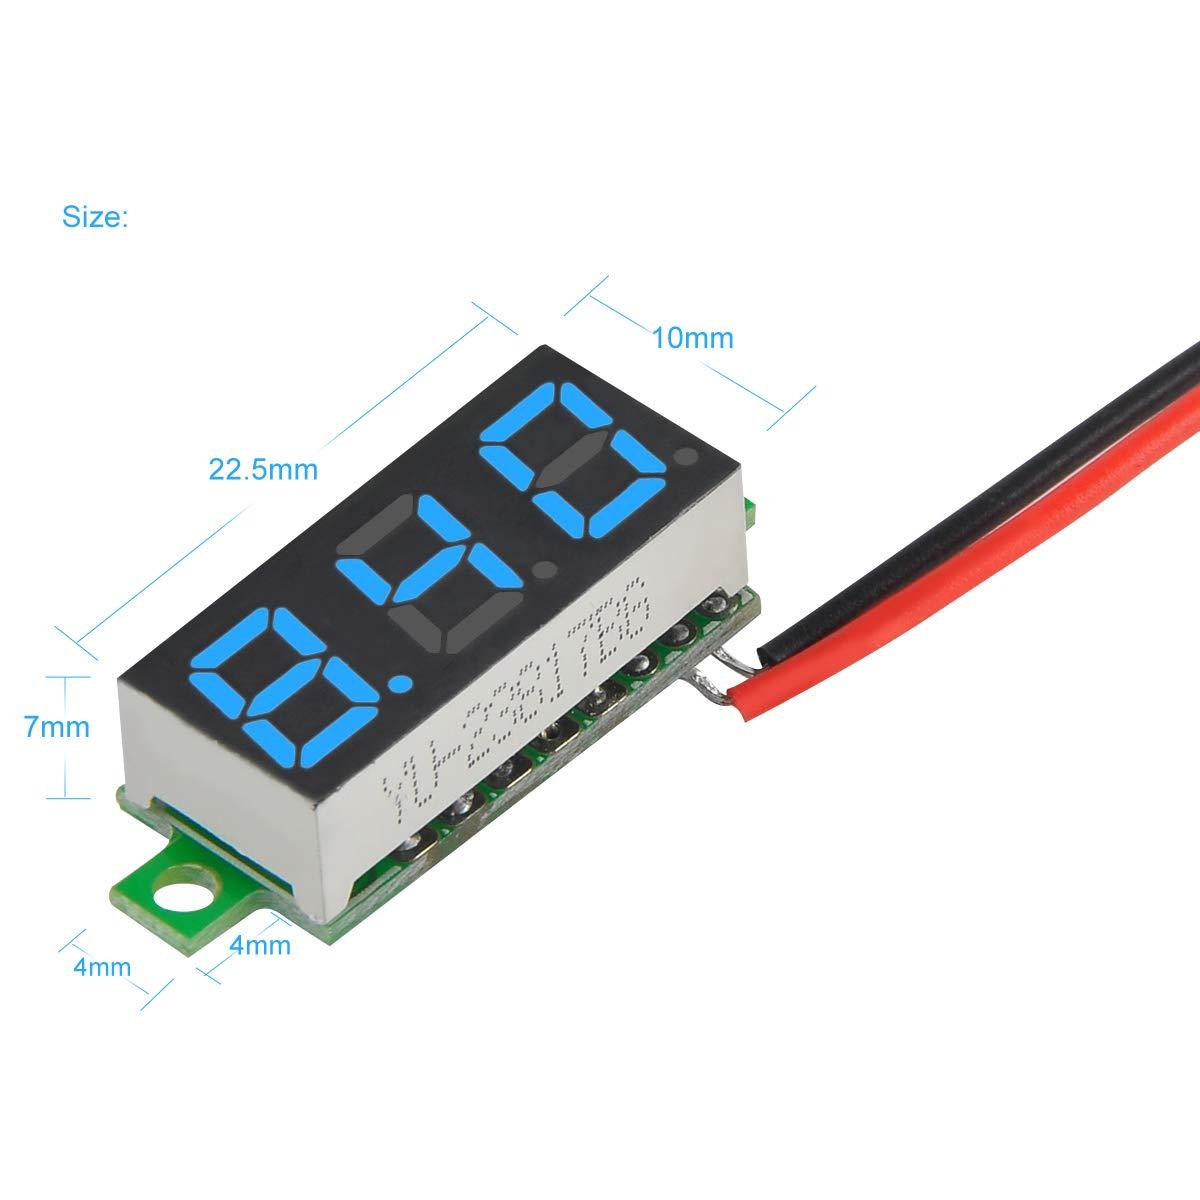 MakerFocus 5pcs Mini Digital DC Voltmeter 0.28 Inch Two-Wire 2.5V-30V Mini Digital DC Voltmeter Voltage Tester Meter 5 Colours by MakerFocus (Image #6)